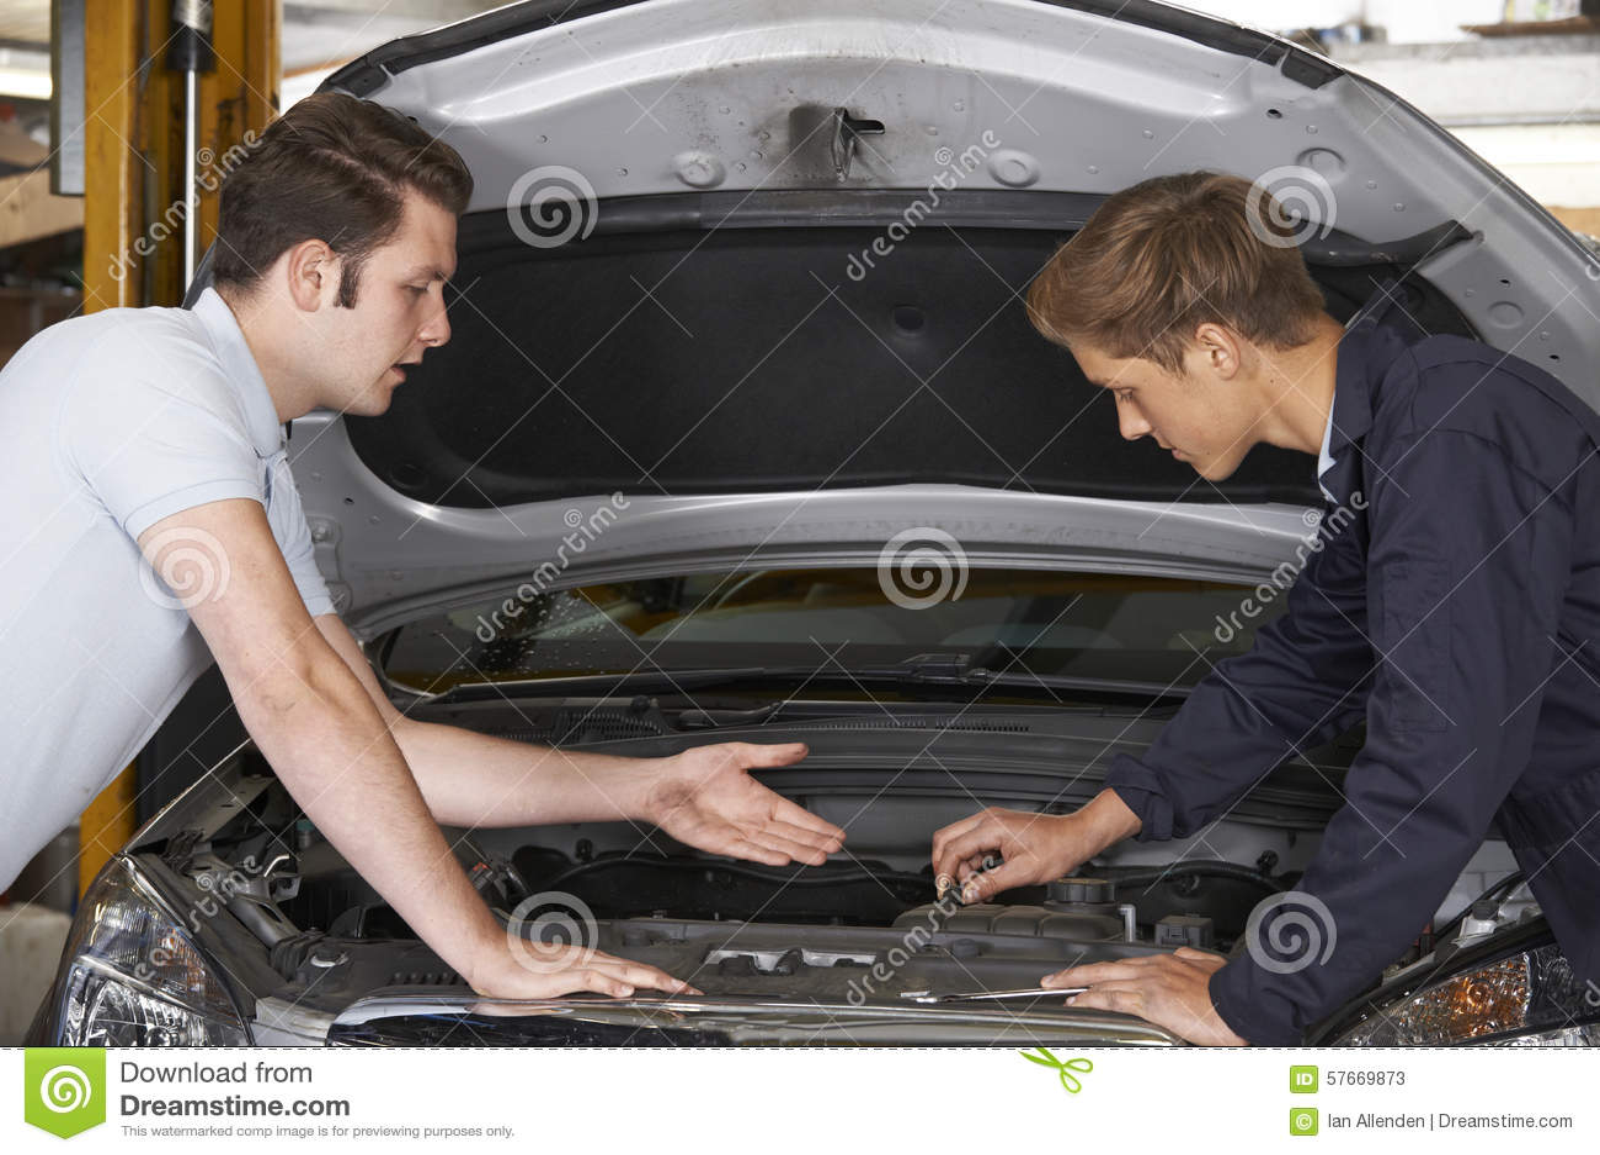 Mechanic Helping Apprentice To Fix Engine